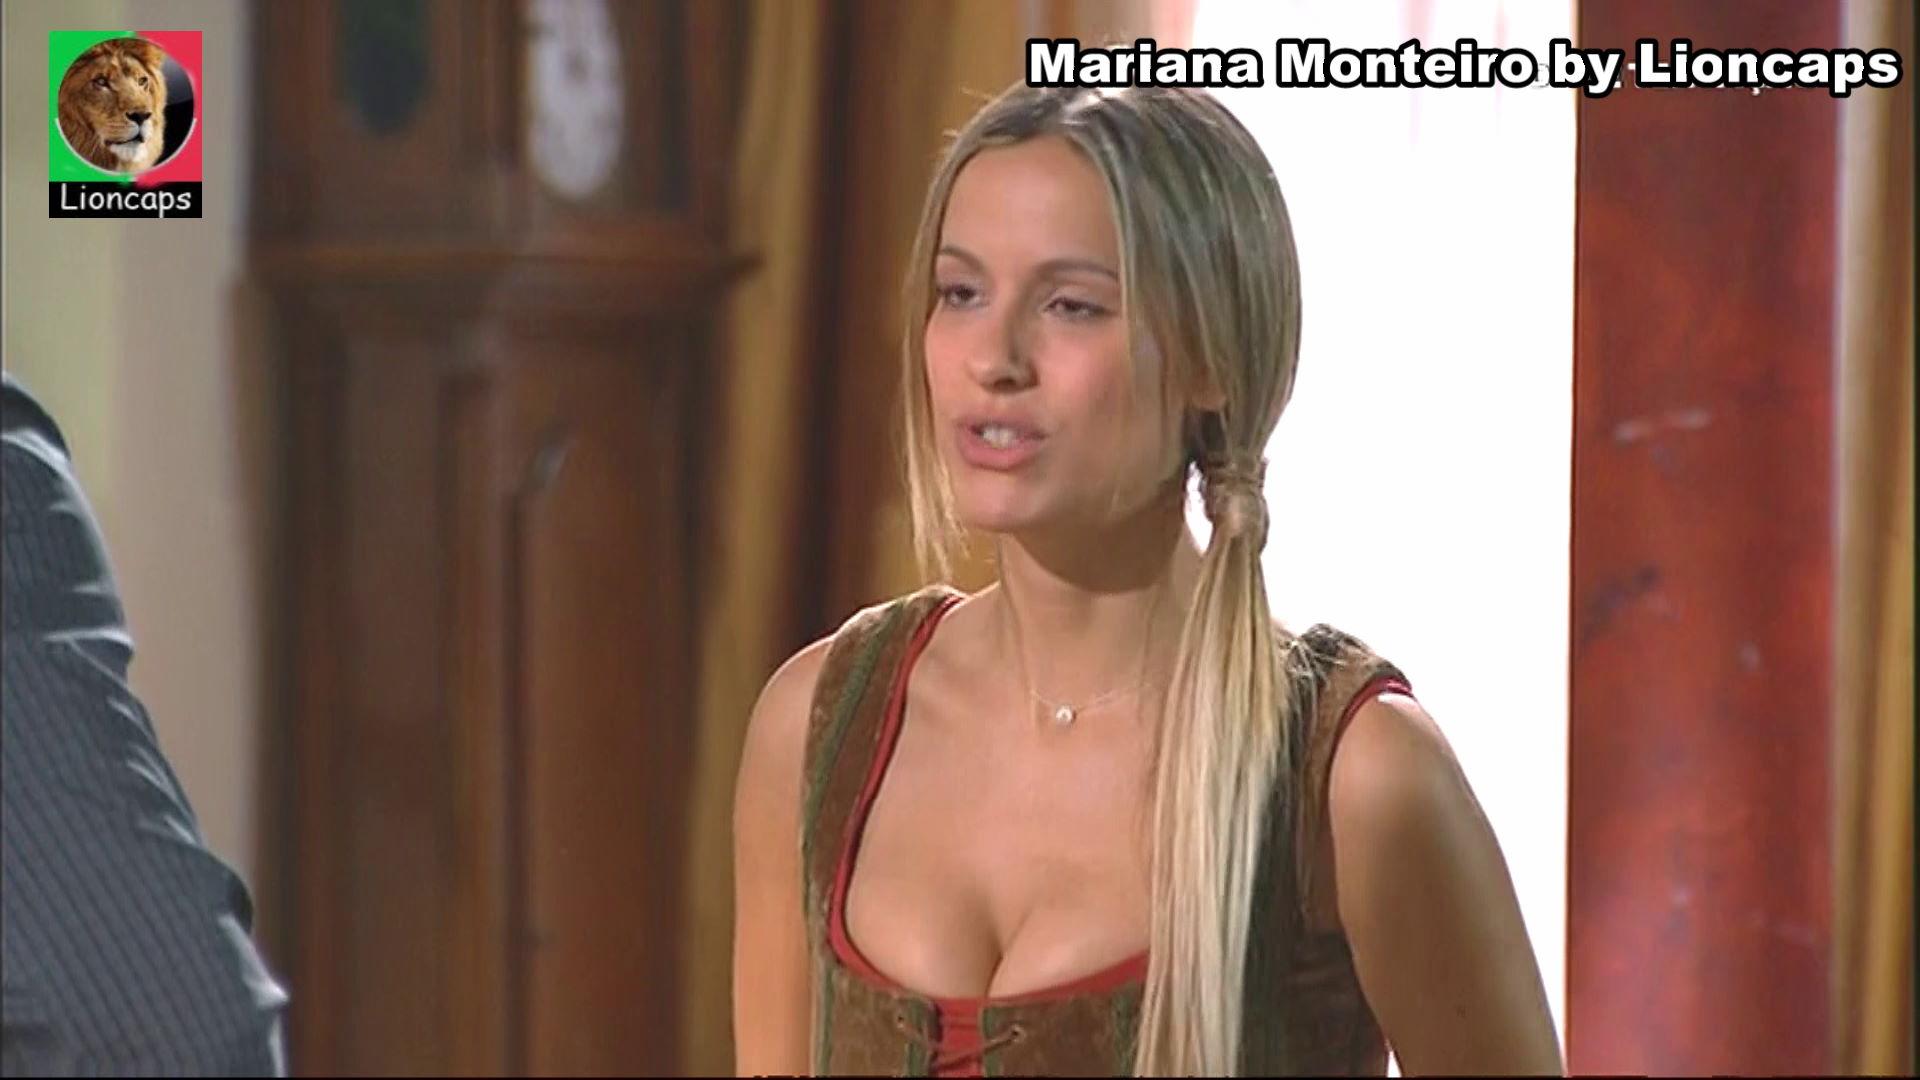 738373508_mariana_monteiro_vs190209_1925_122_495lo.JPG